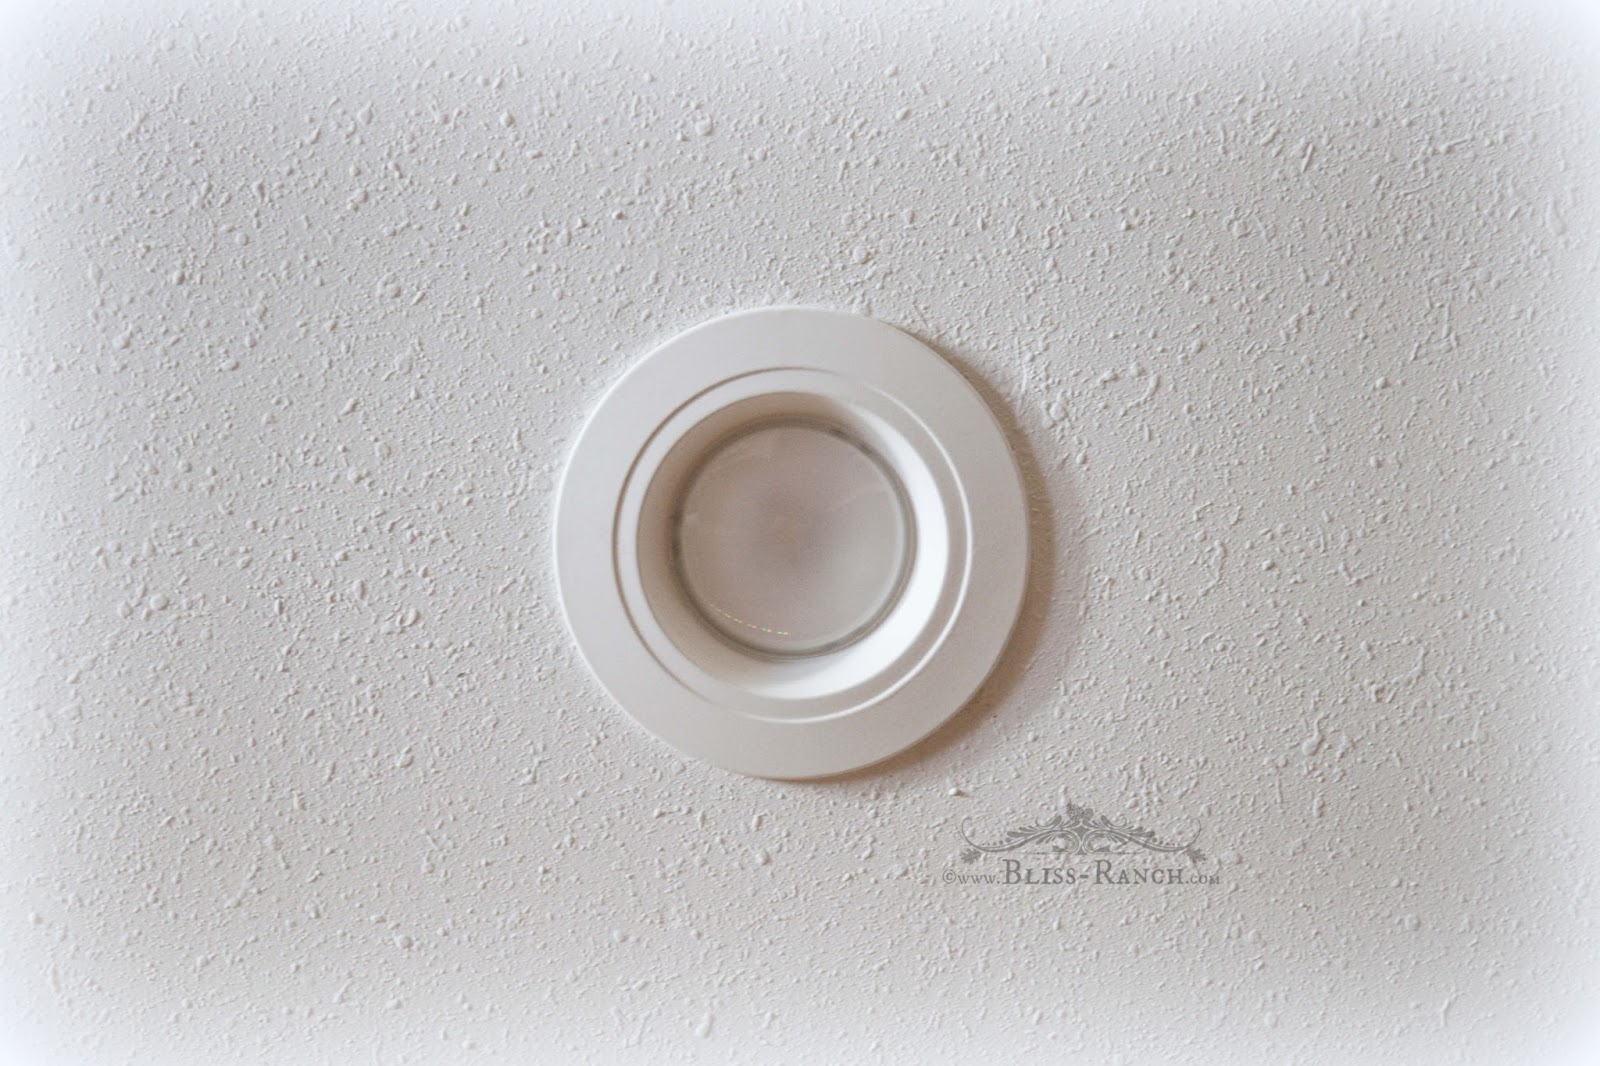 Halo Lighting LED recessed light, Bliss-Ranch.com #westsidewholesale #halolighting